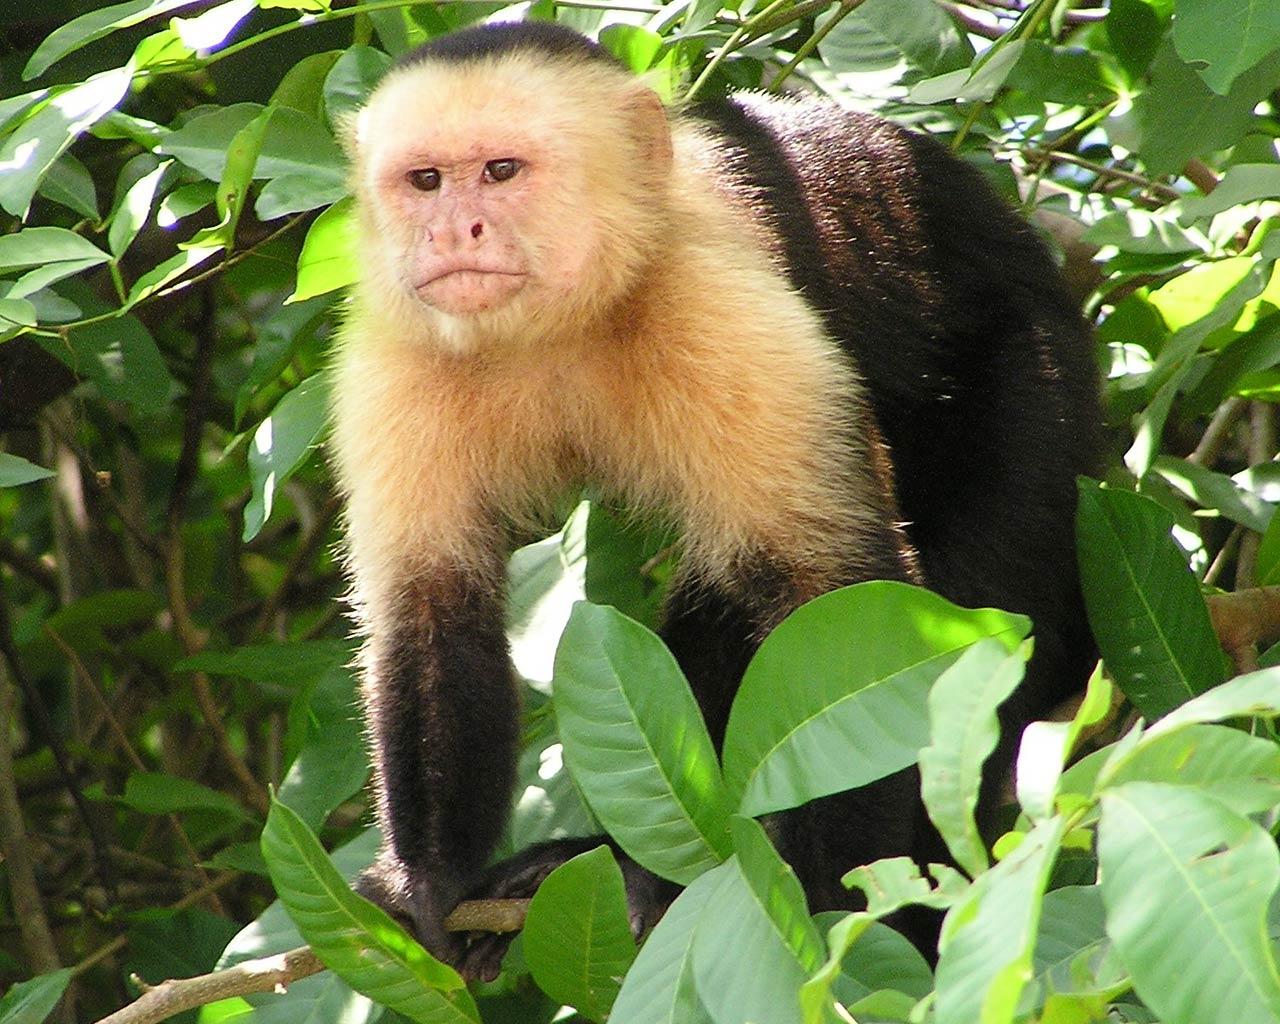 Monkey Wallpaper capuchin monkey wallpaper - animals town